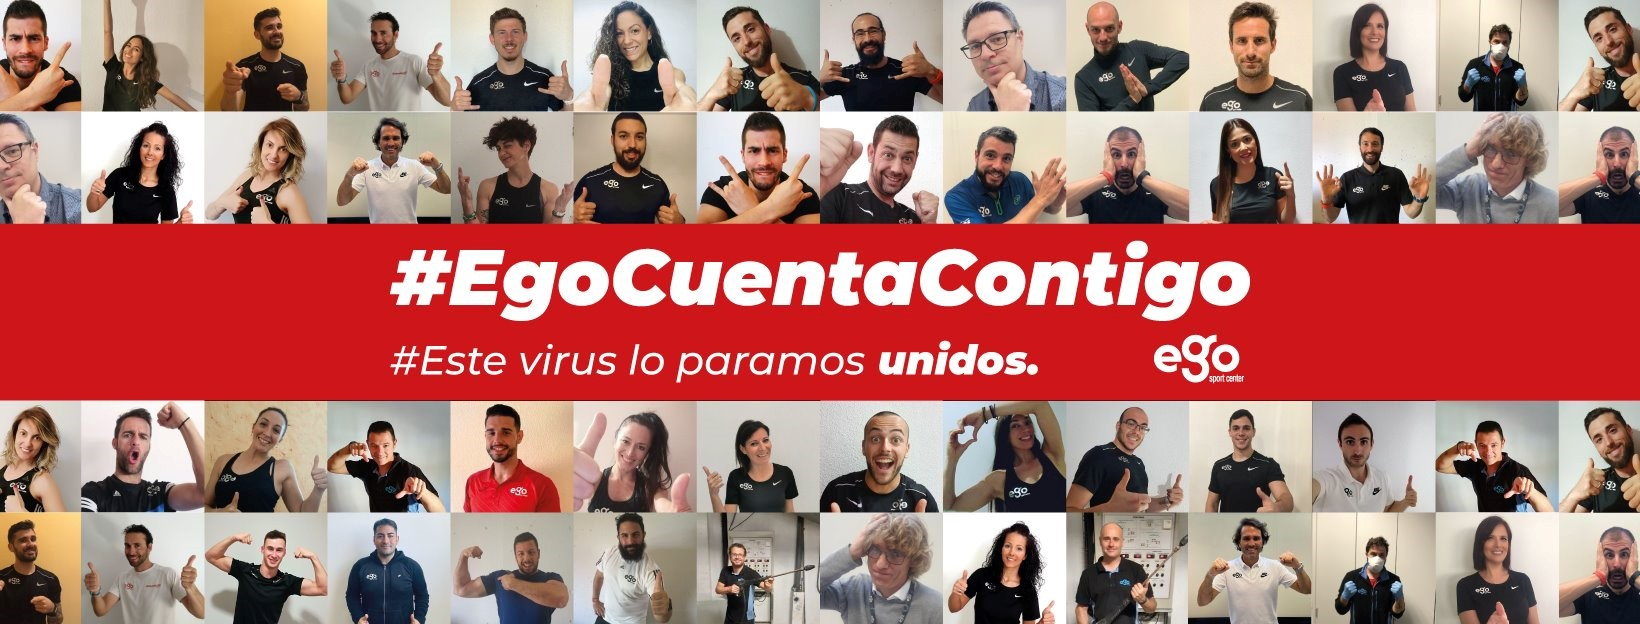 Ego Sport Center se une a la campaña 'Resistiré'